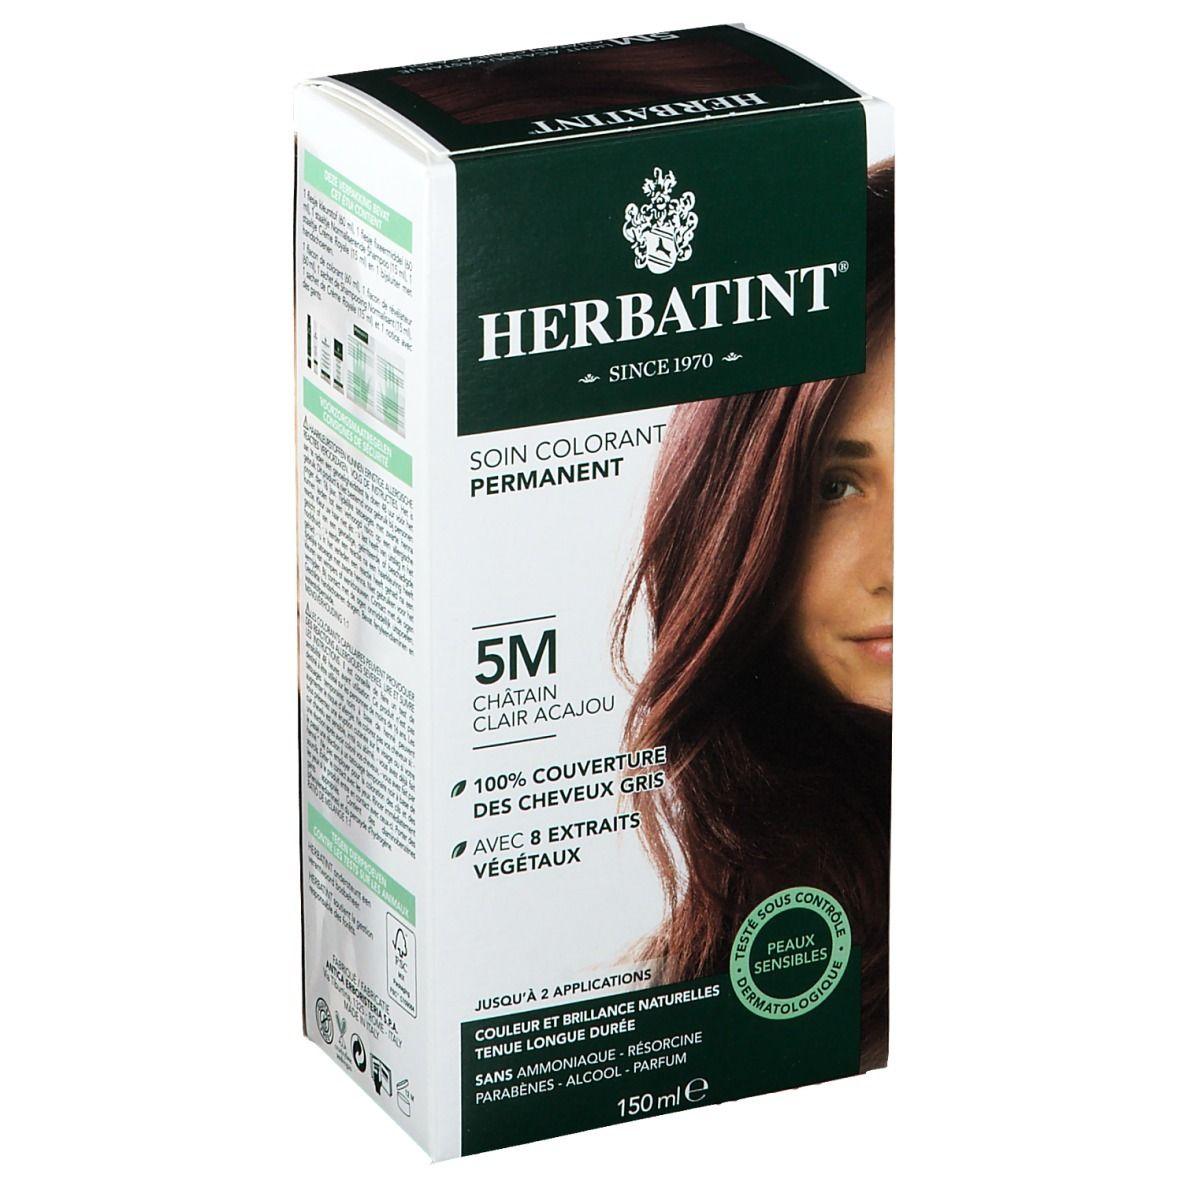 Herbatint Soin Colorant Permanent Châtain Clair Acajou 5M ml solution(s)